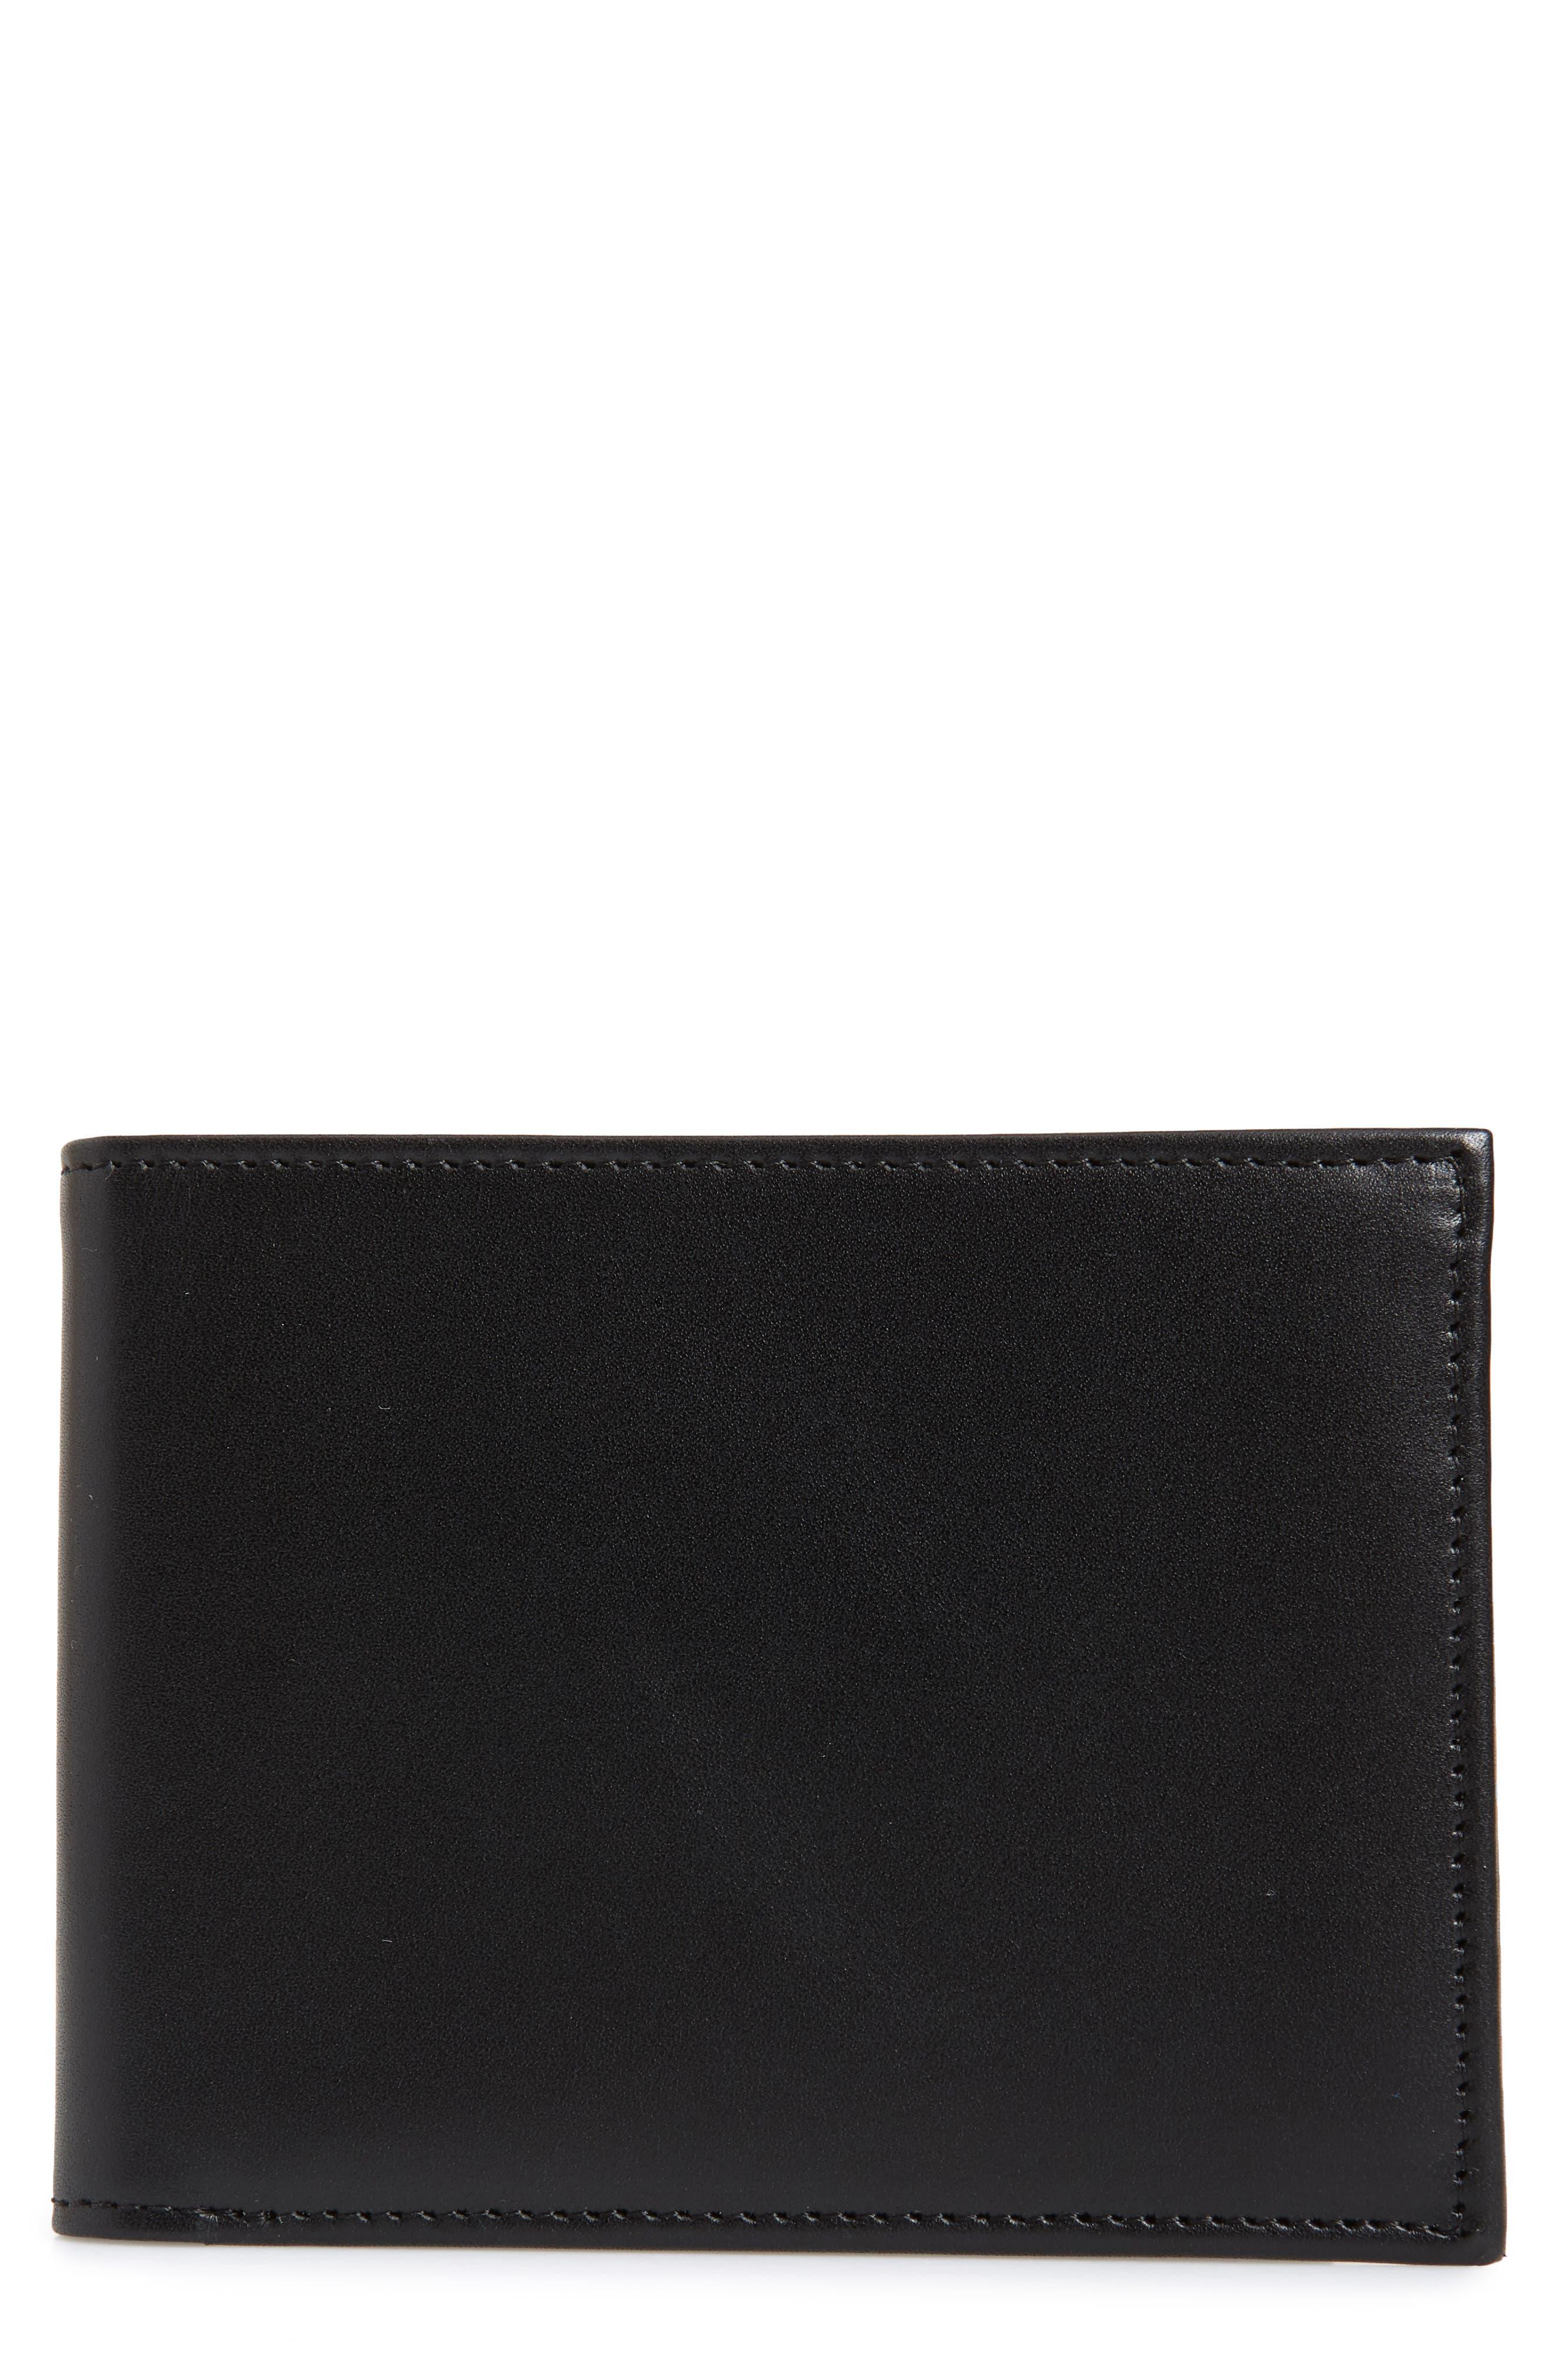 NORDSTROM MEN'S SHOP Chelsea Leather Wallet, Main, color, BLACK